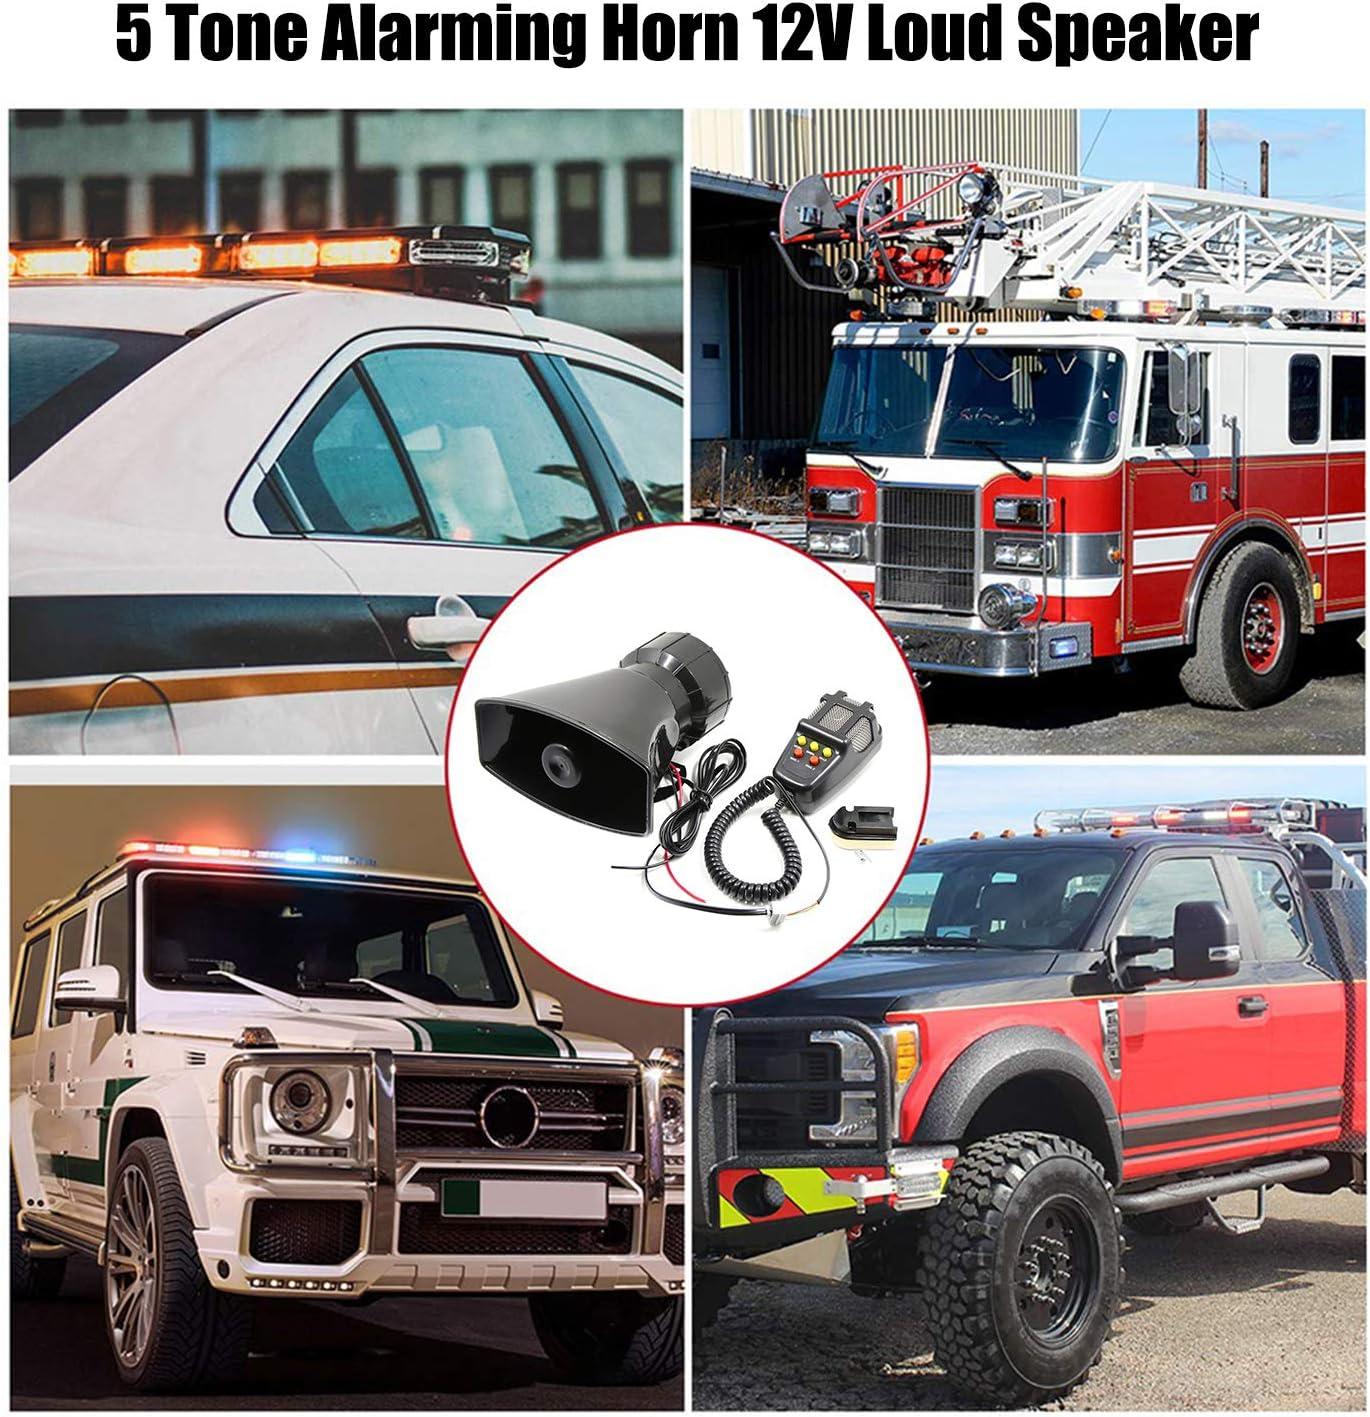 KKmoon Car Motorcycle Horn 6 Tone Loudspeaker Super Loud Megaphone Horn 12 V Alarm Wailing Ambulance Blaring Police Siren Item Name aka Title